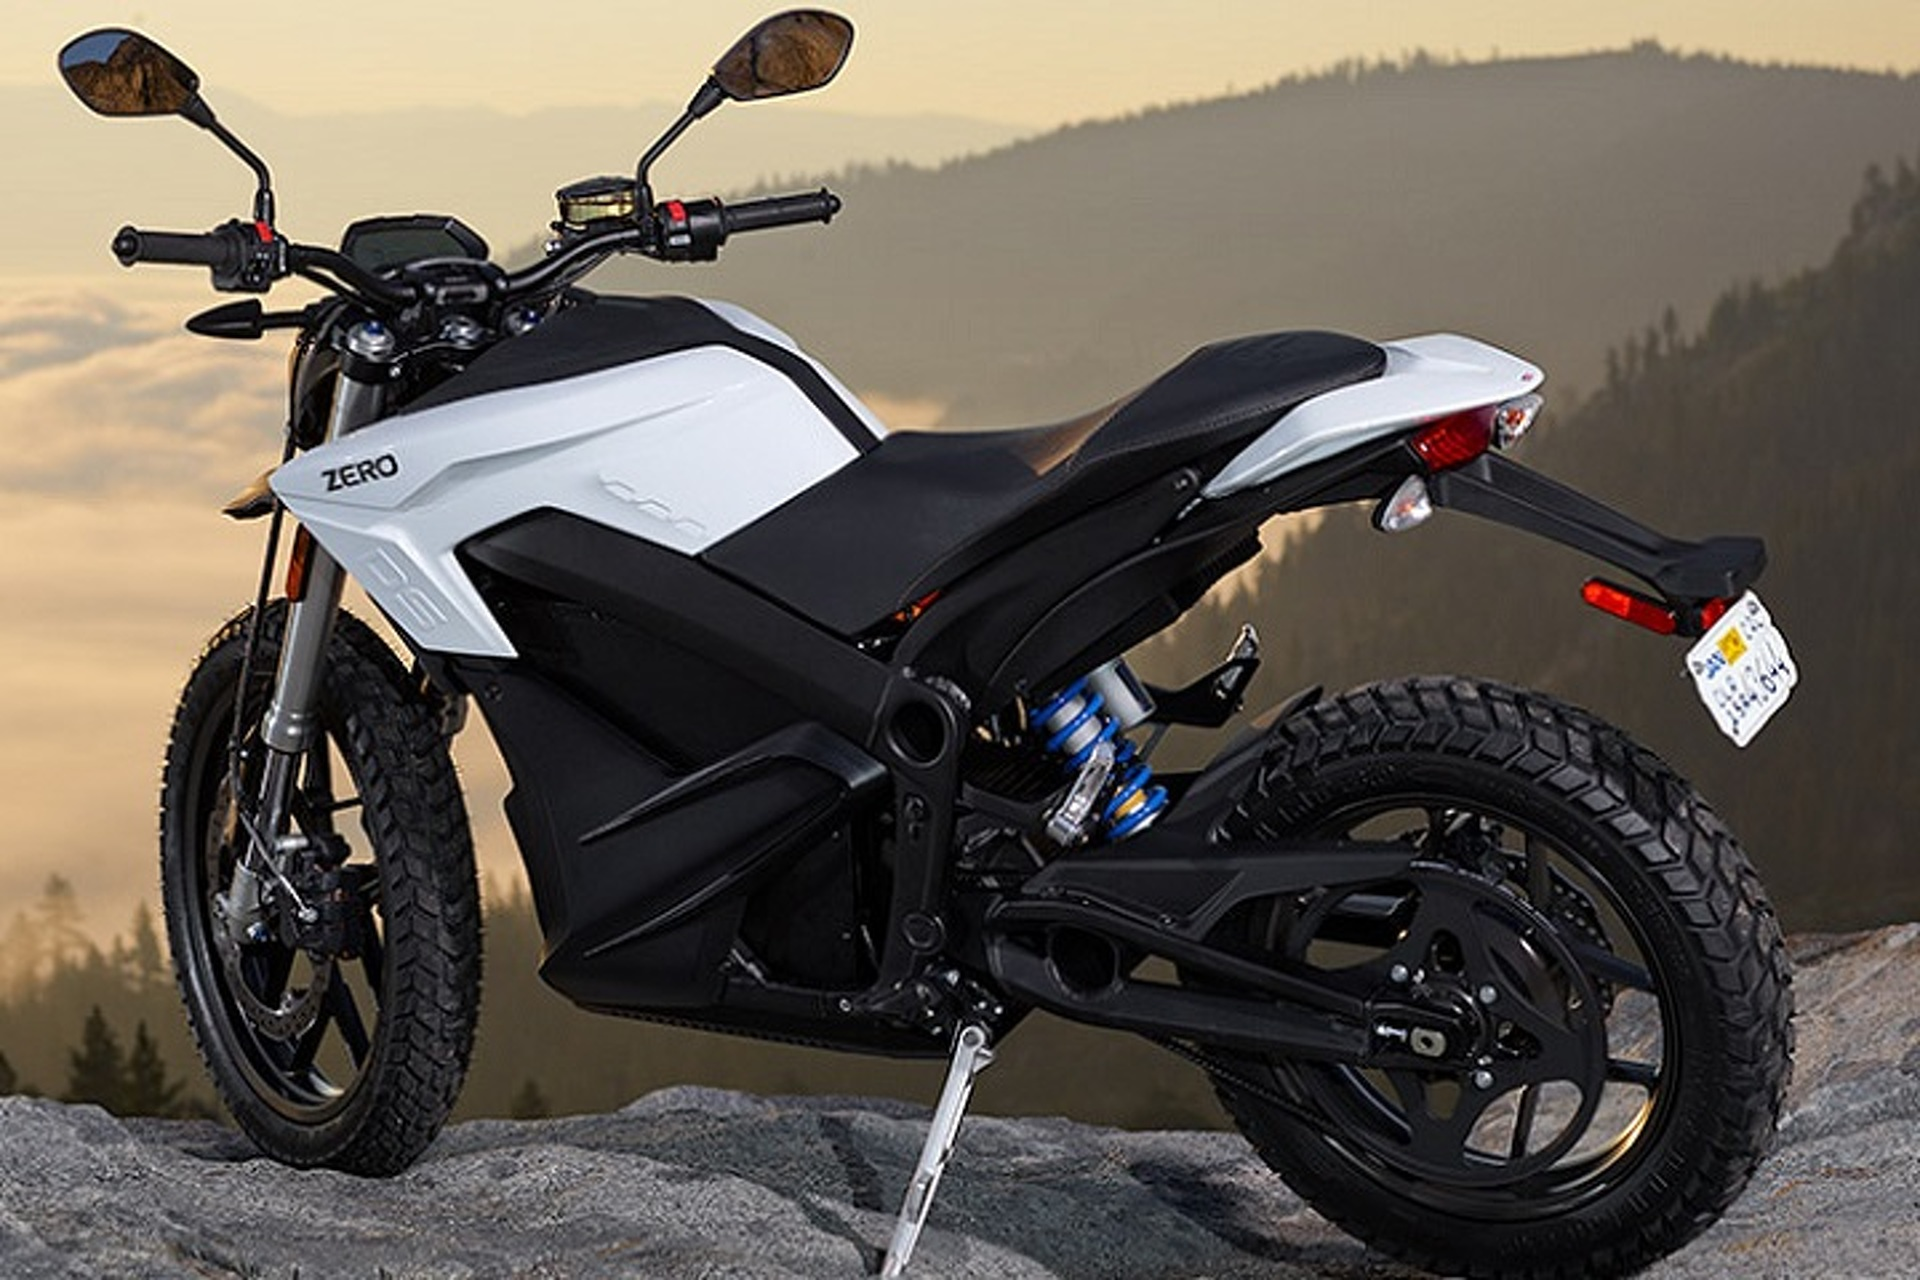 motorcycles beginner perfect zero ds motorcycle motor1 sport electric